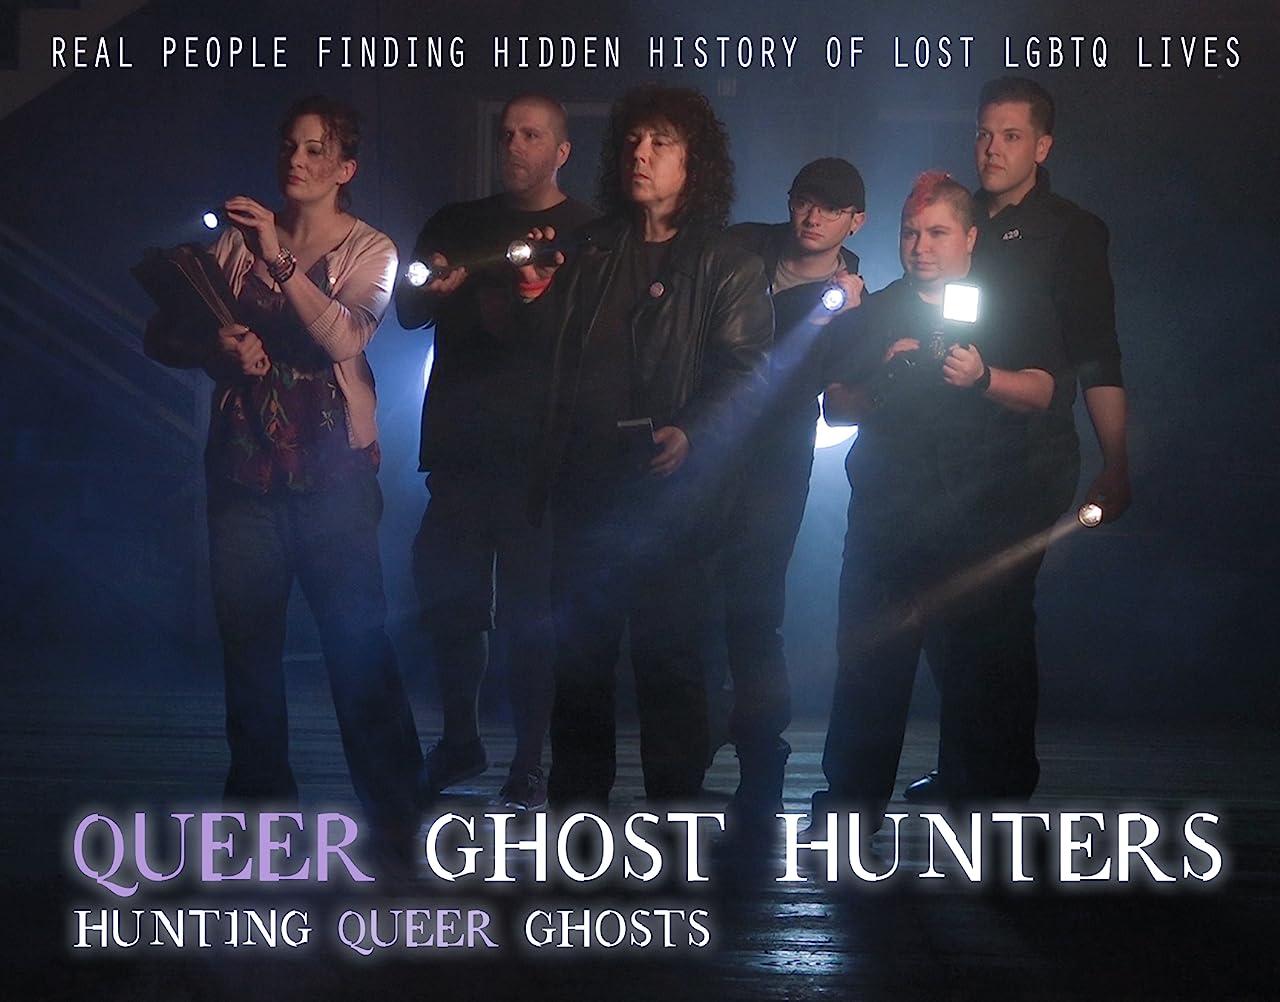 Queer ghost hunters